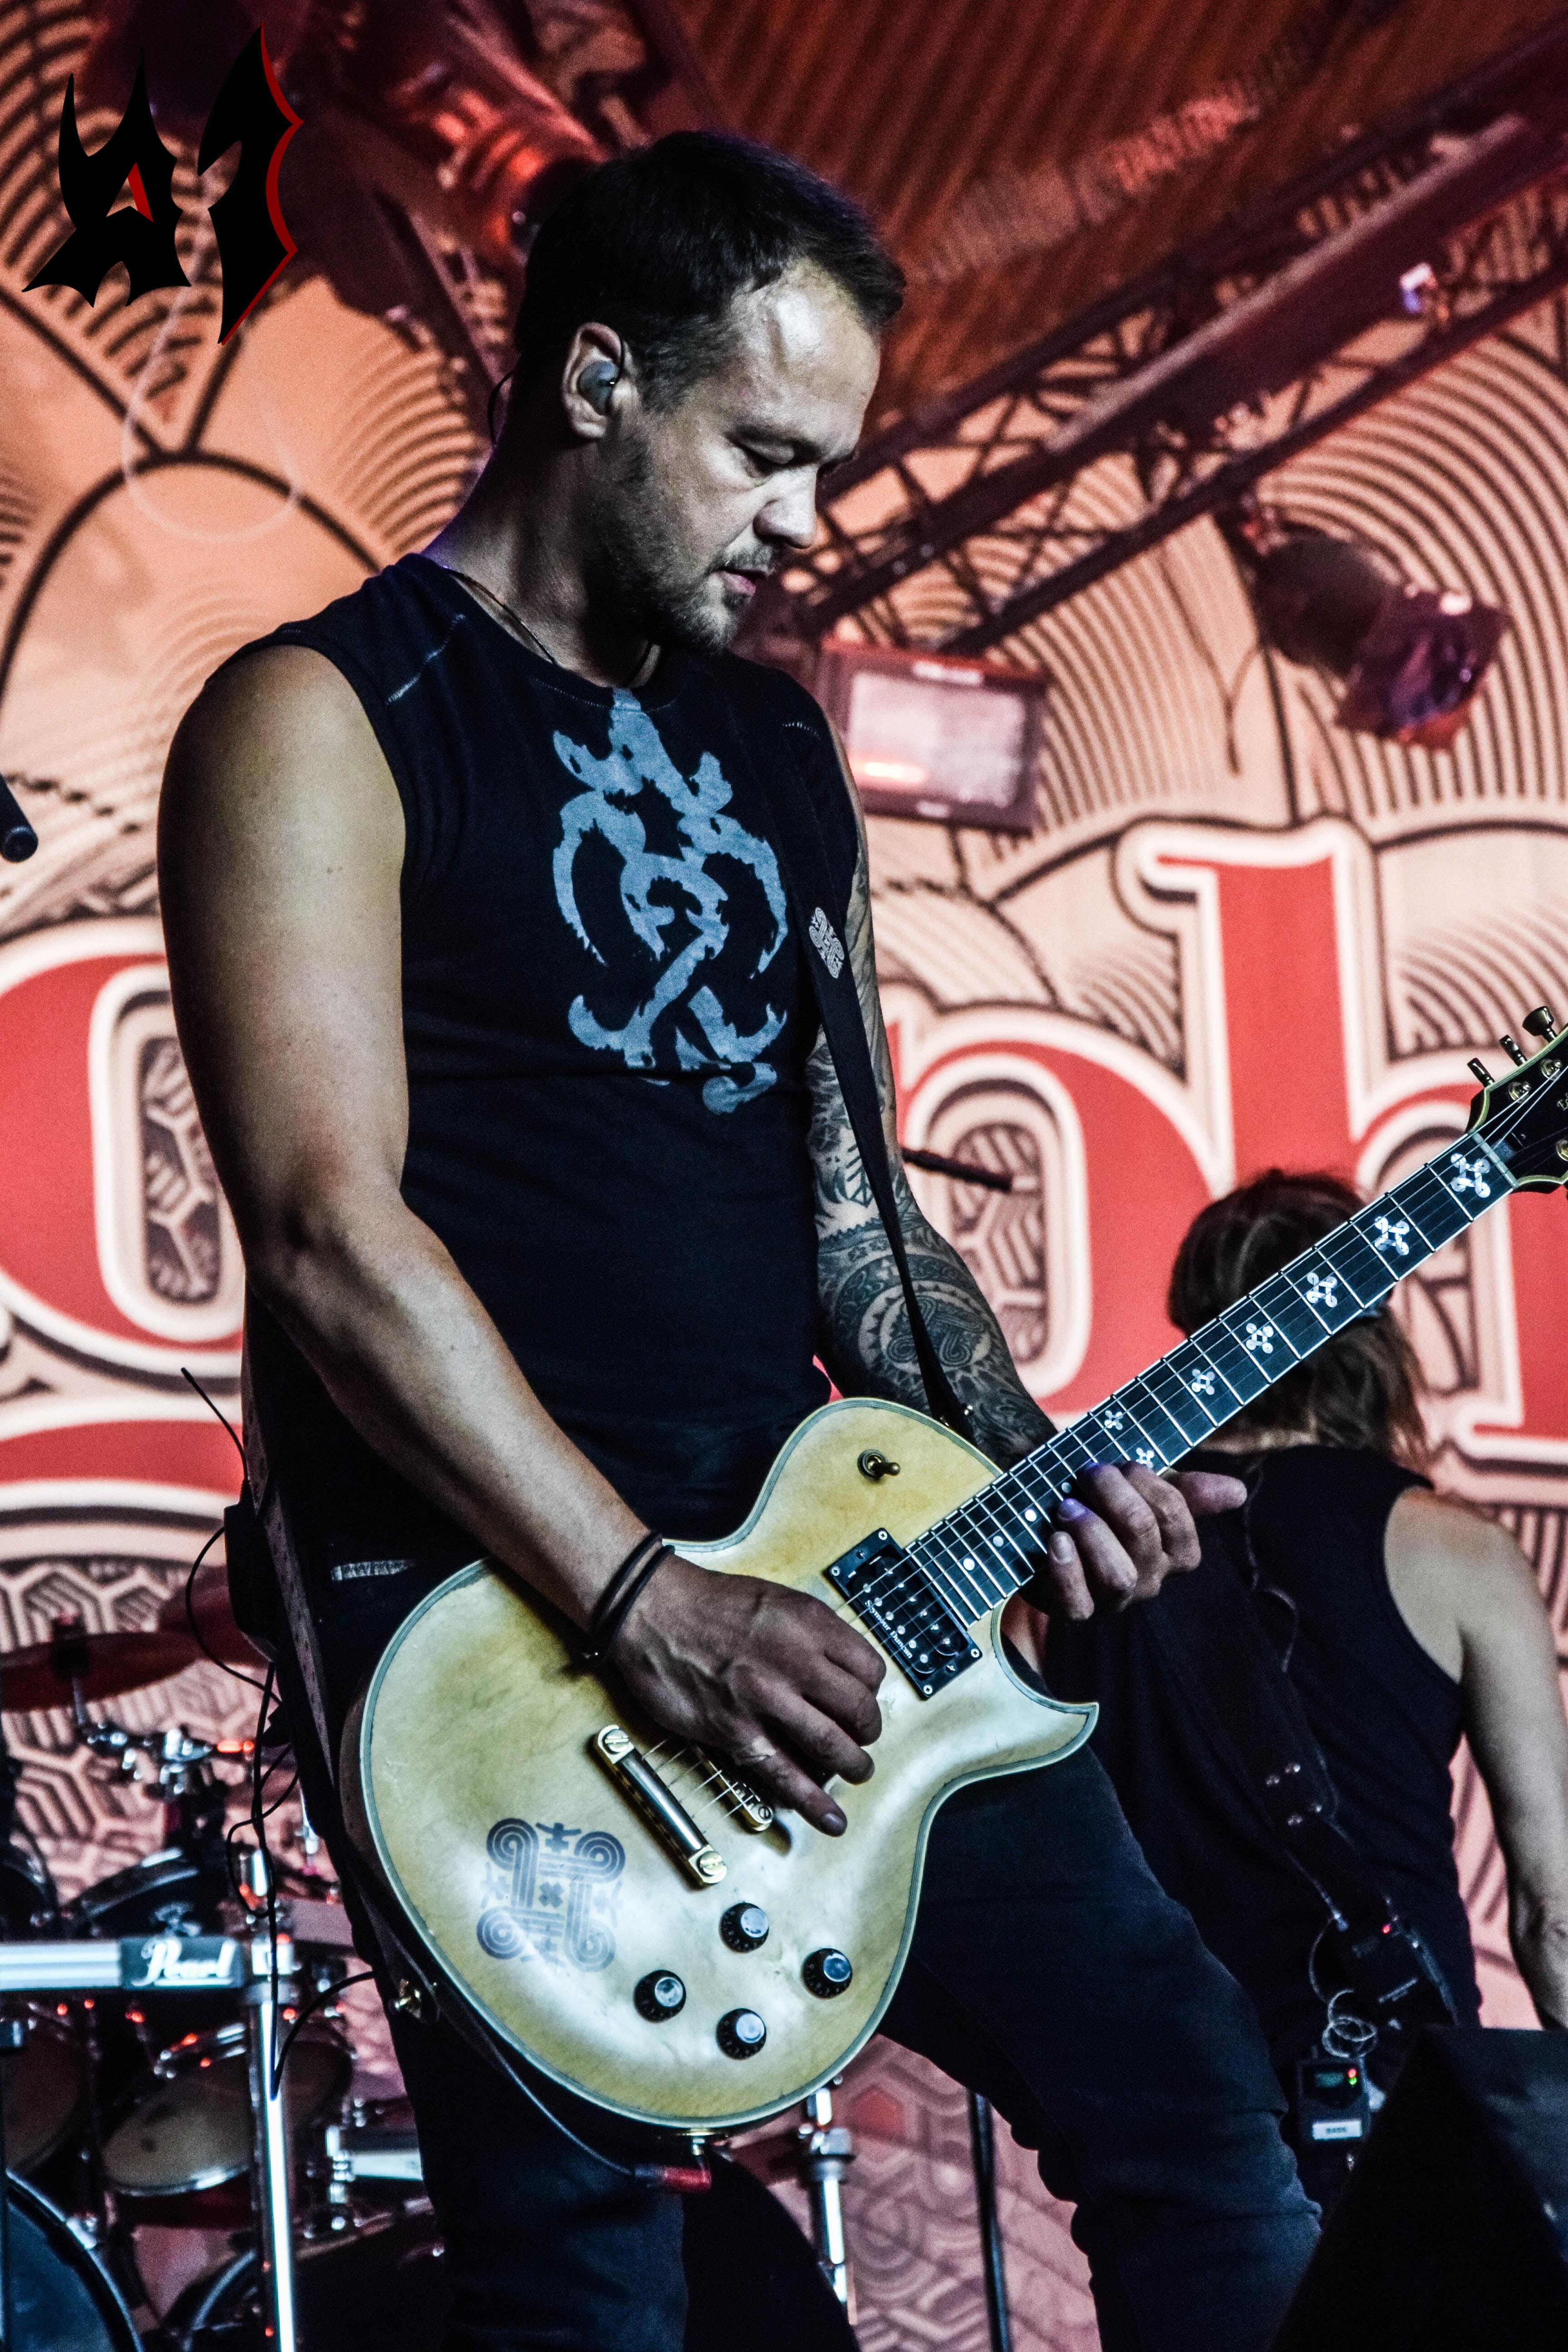 Hellfest 2018 – Day 3 - Amorphis 4